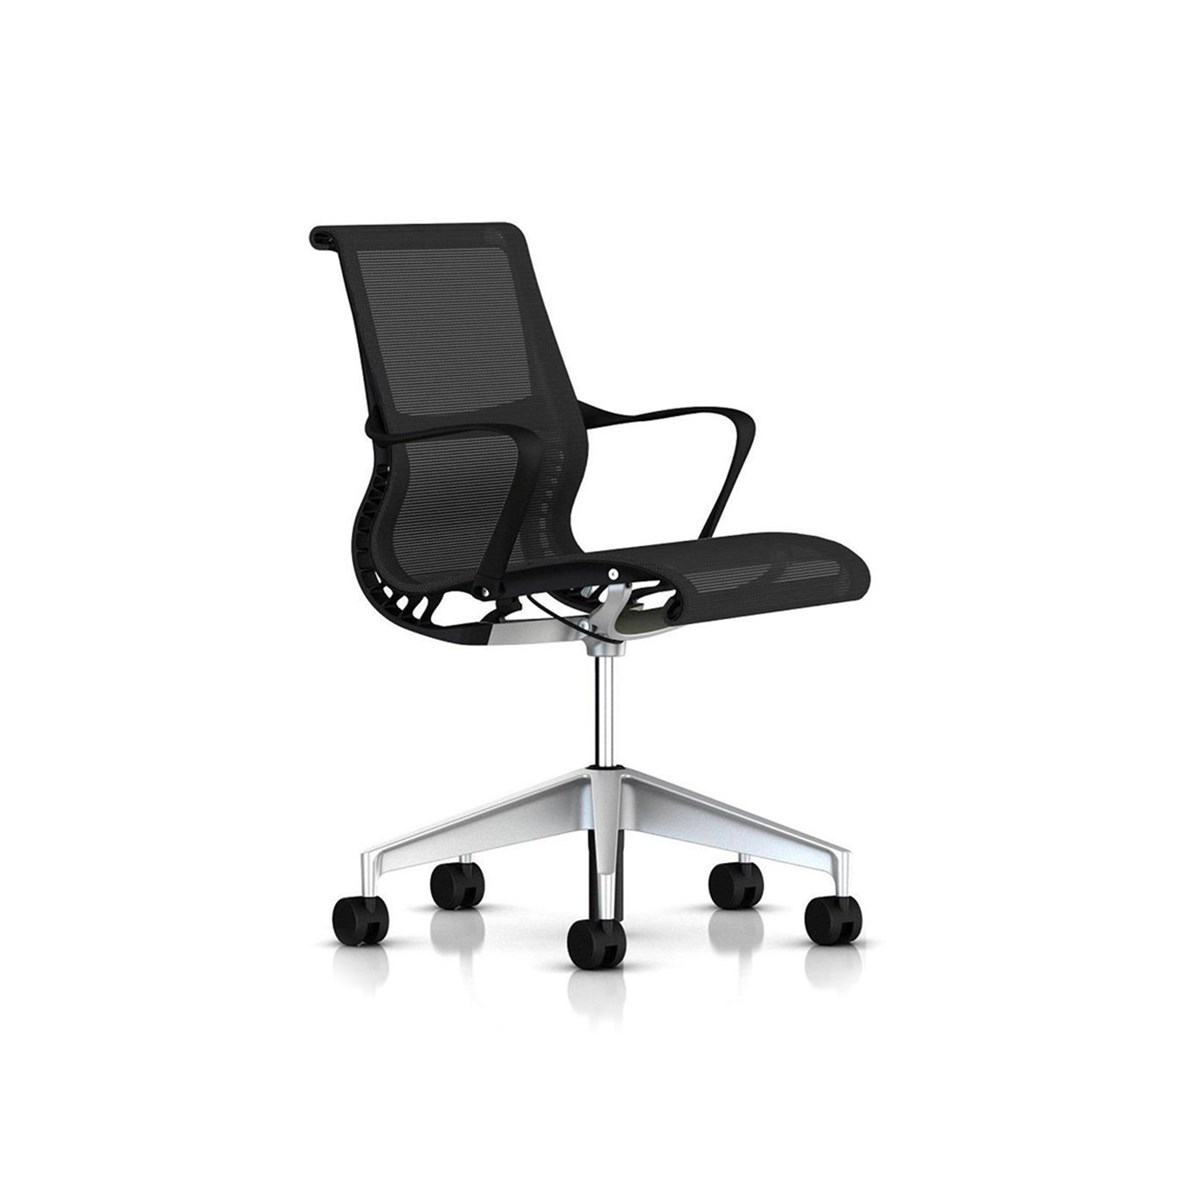 Herman-Miller-Studio-7.5-Setu®-Chairs-Graphite-Matisse-1